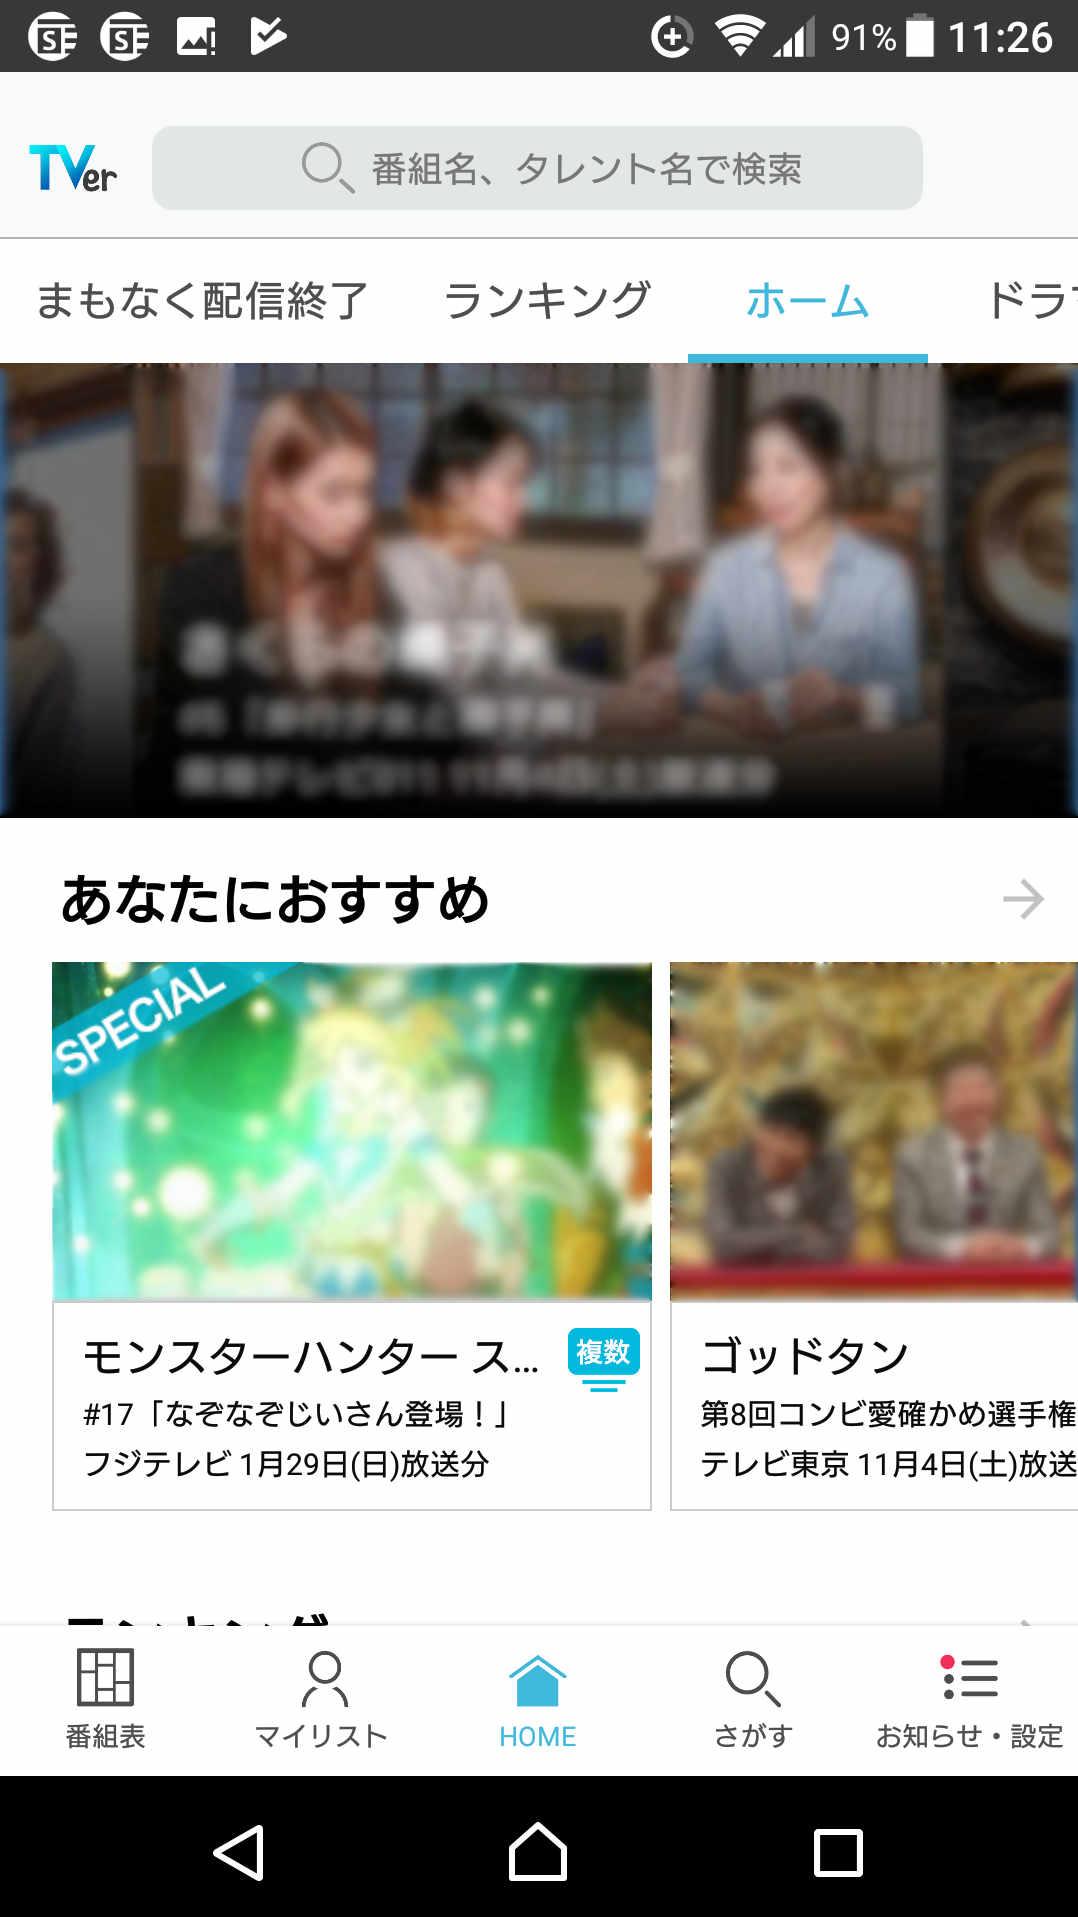 TVerのアプリ画面